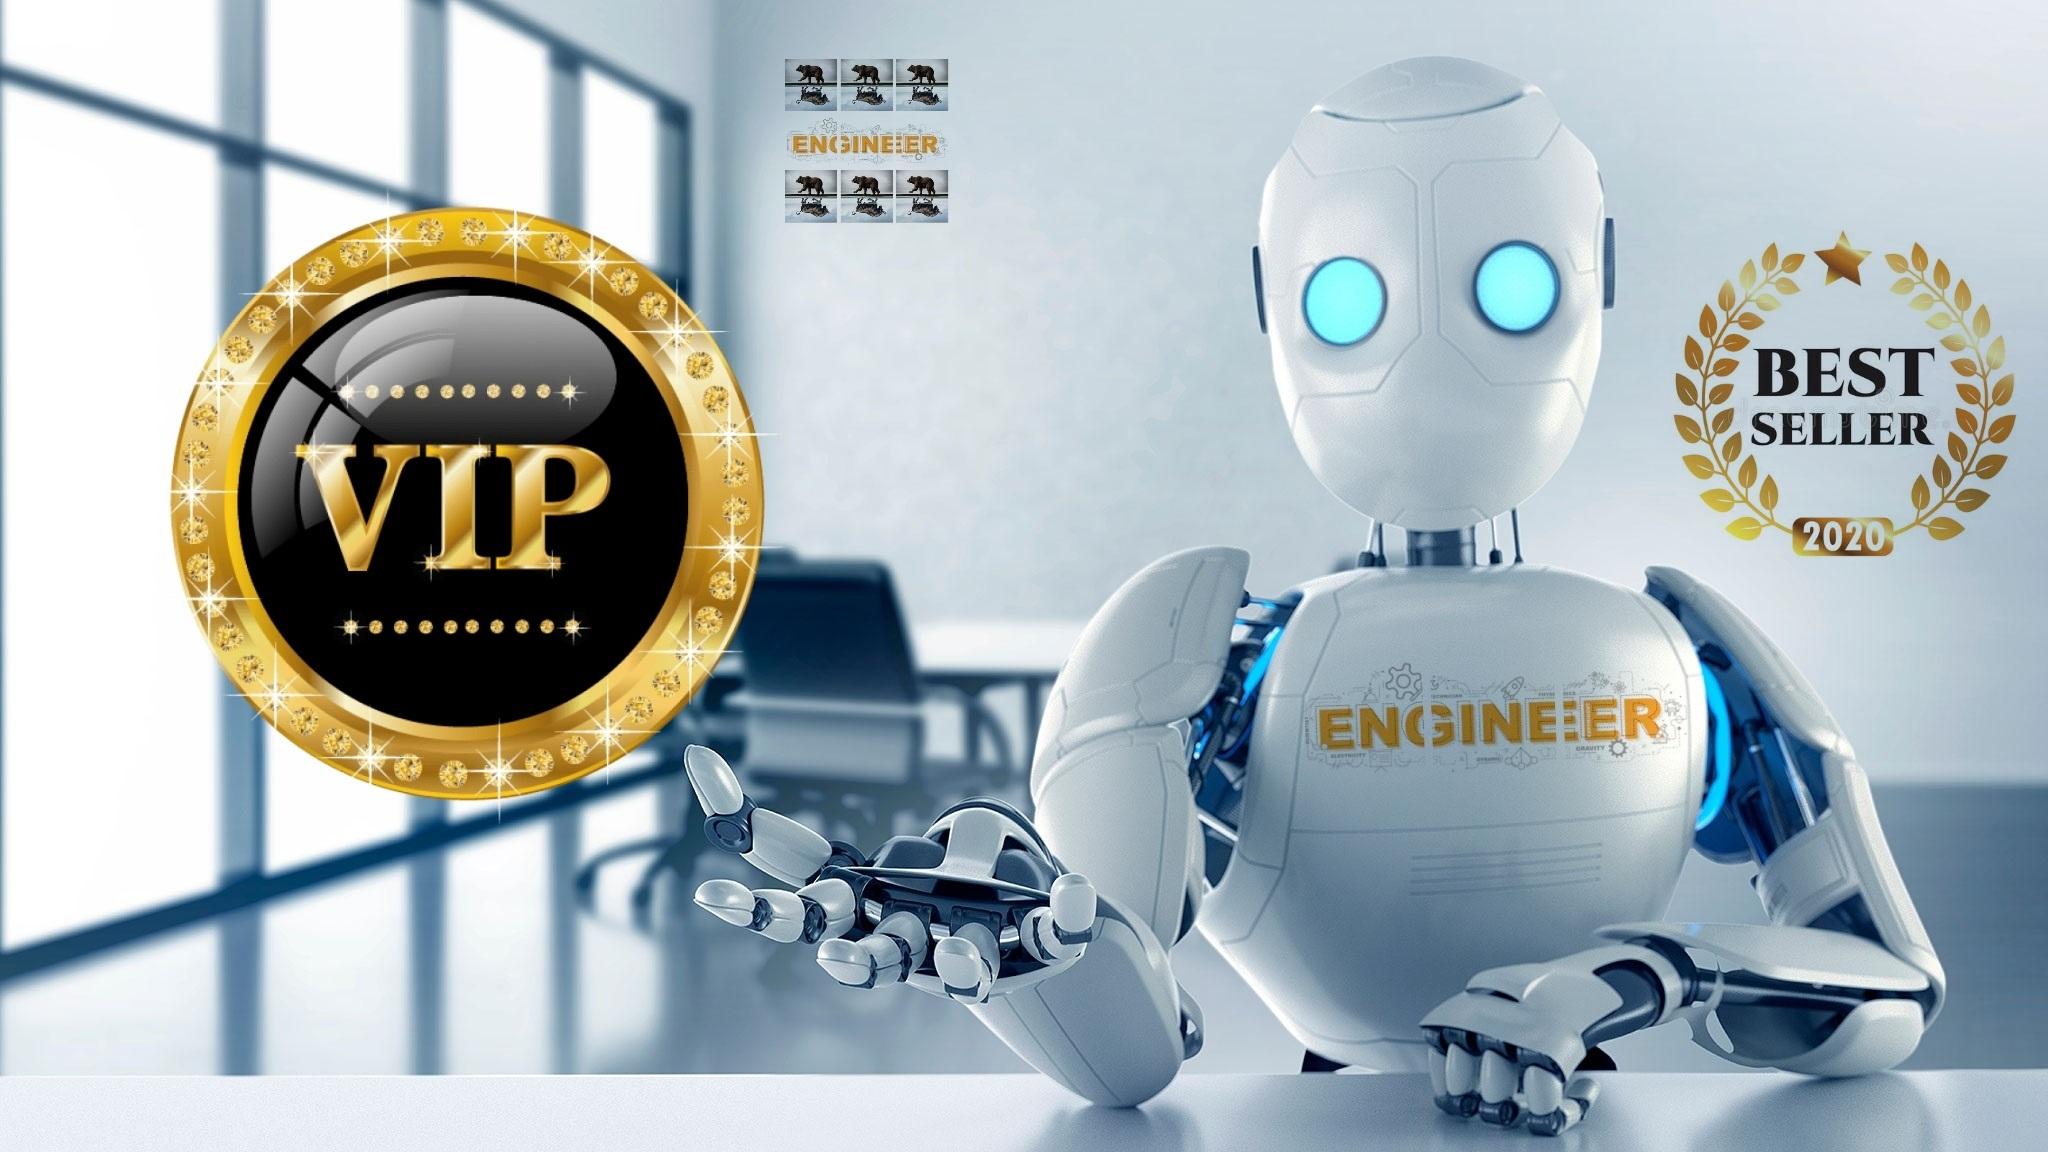 engineering robo vip